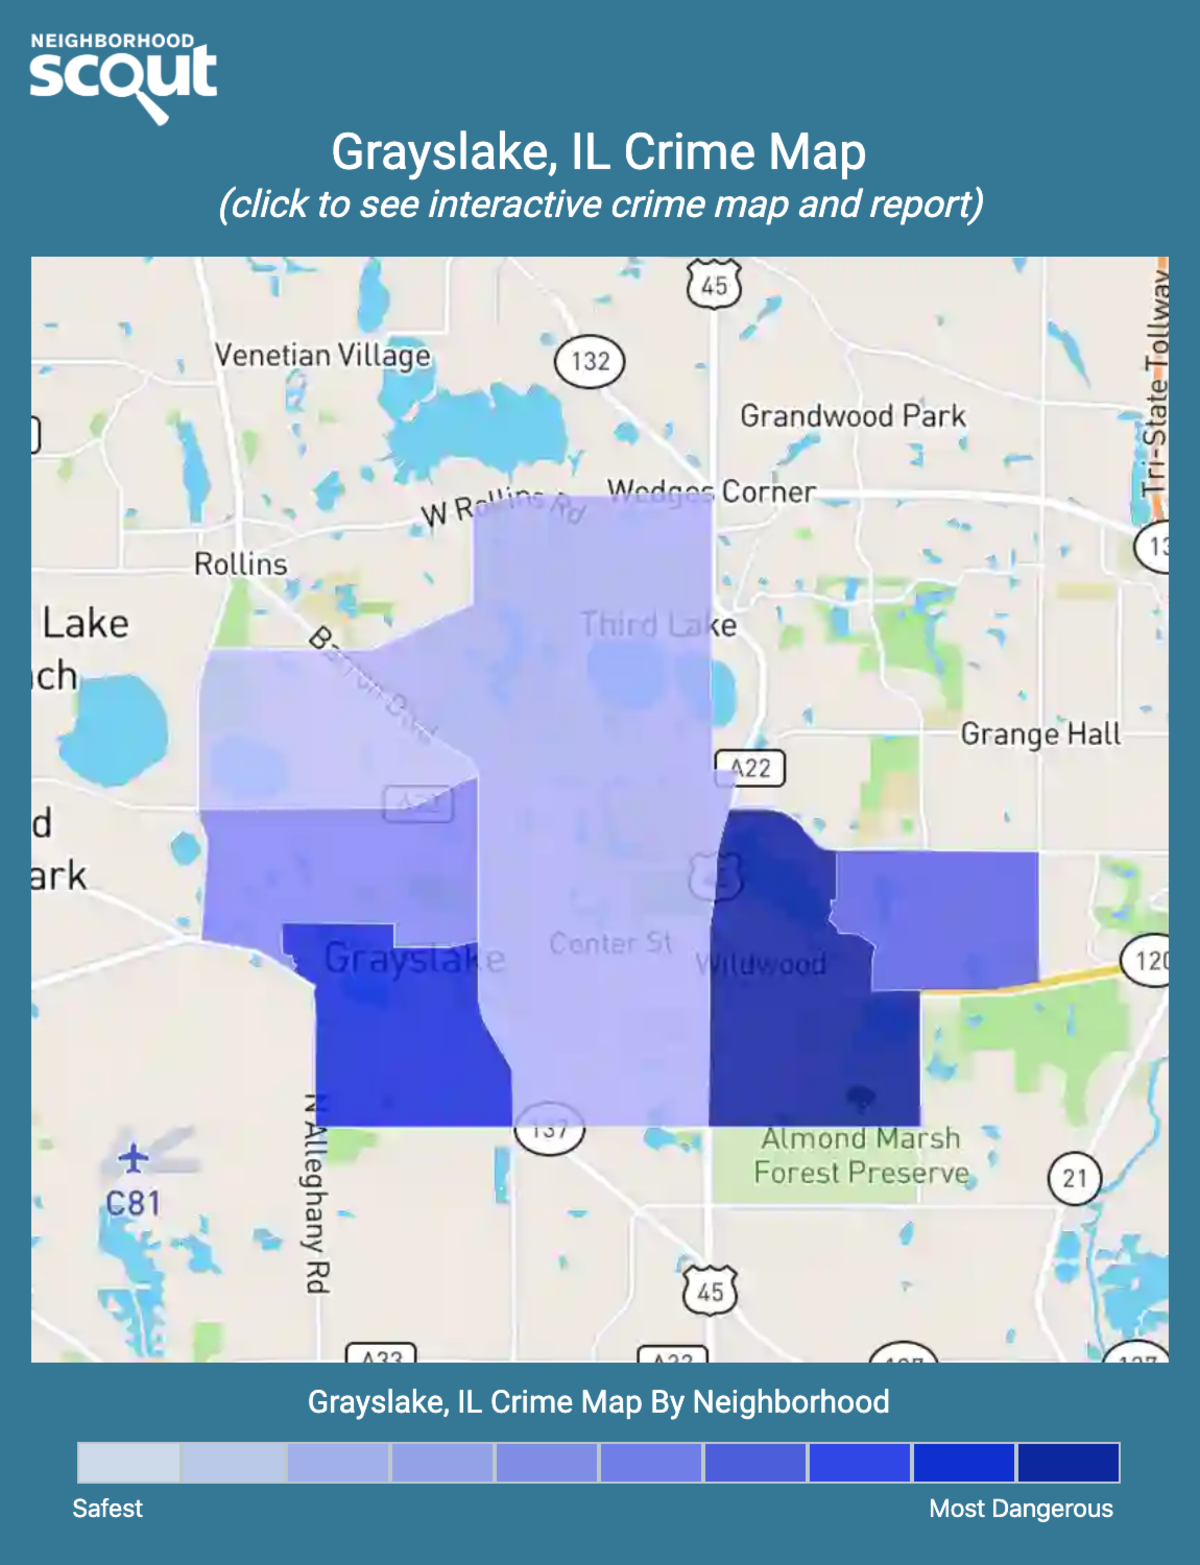 Grayslake, Illinois crime map